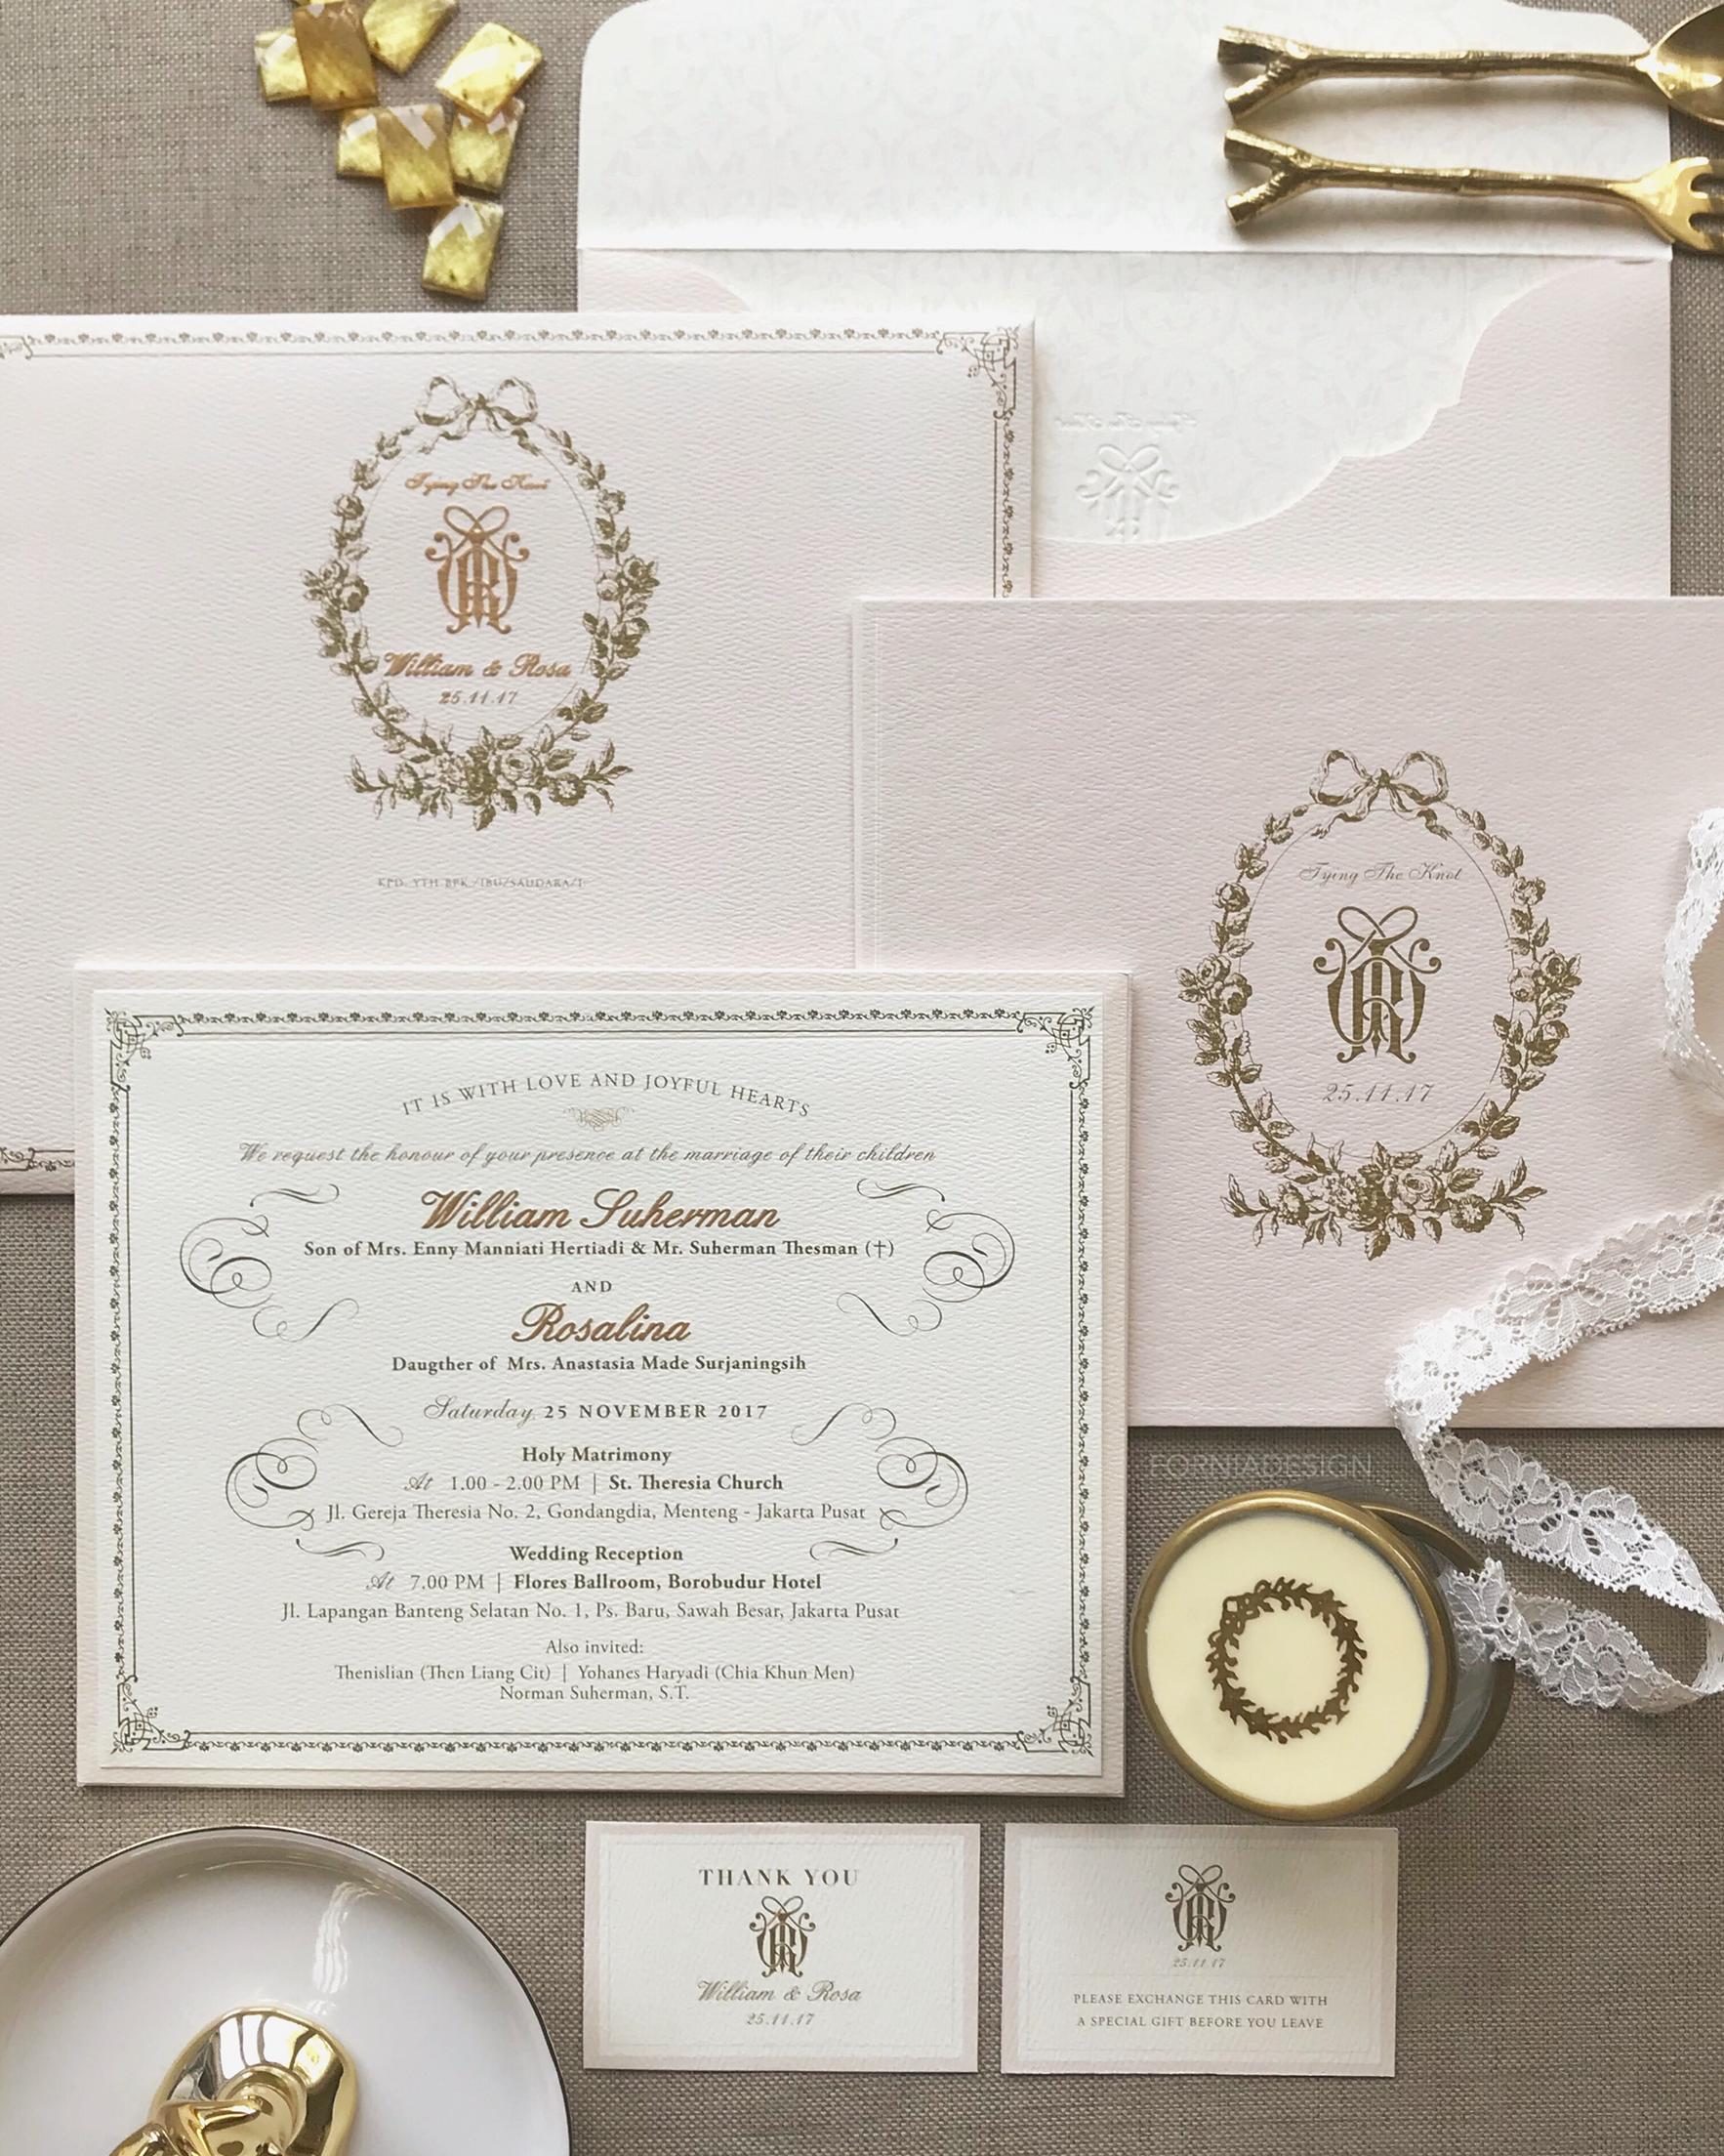 Wedding card malaysia crafty farms handmade royal navy blue punch fornia design invitation wedding invitations in jakarta wedding card design jakarta stopboris Choice Image